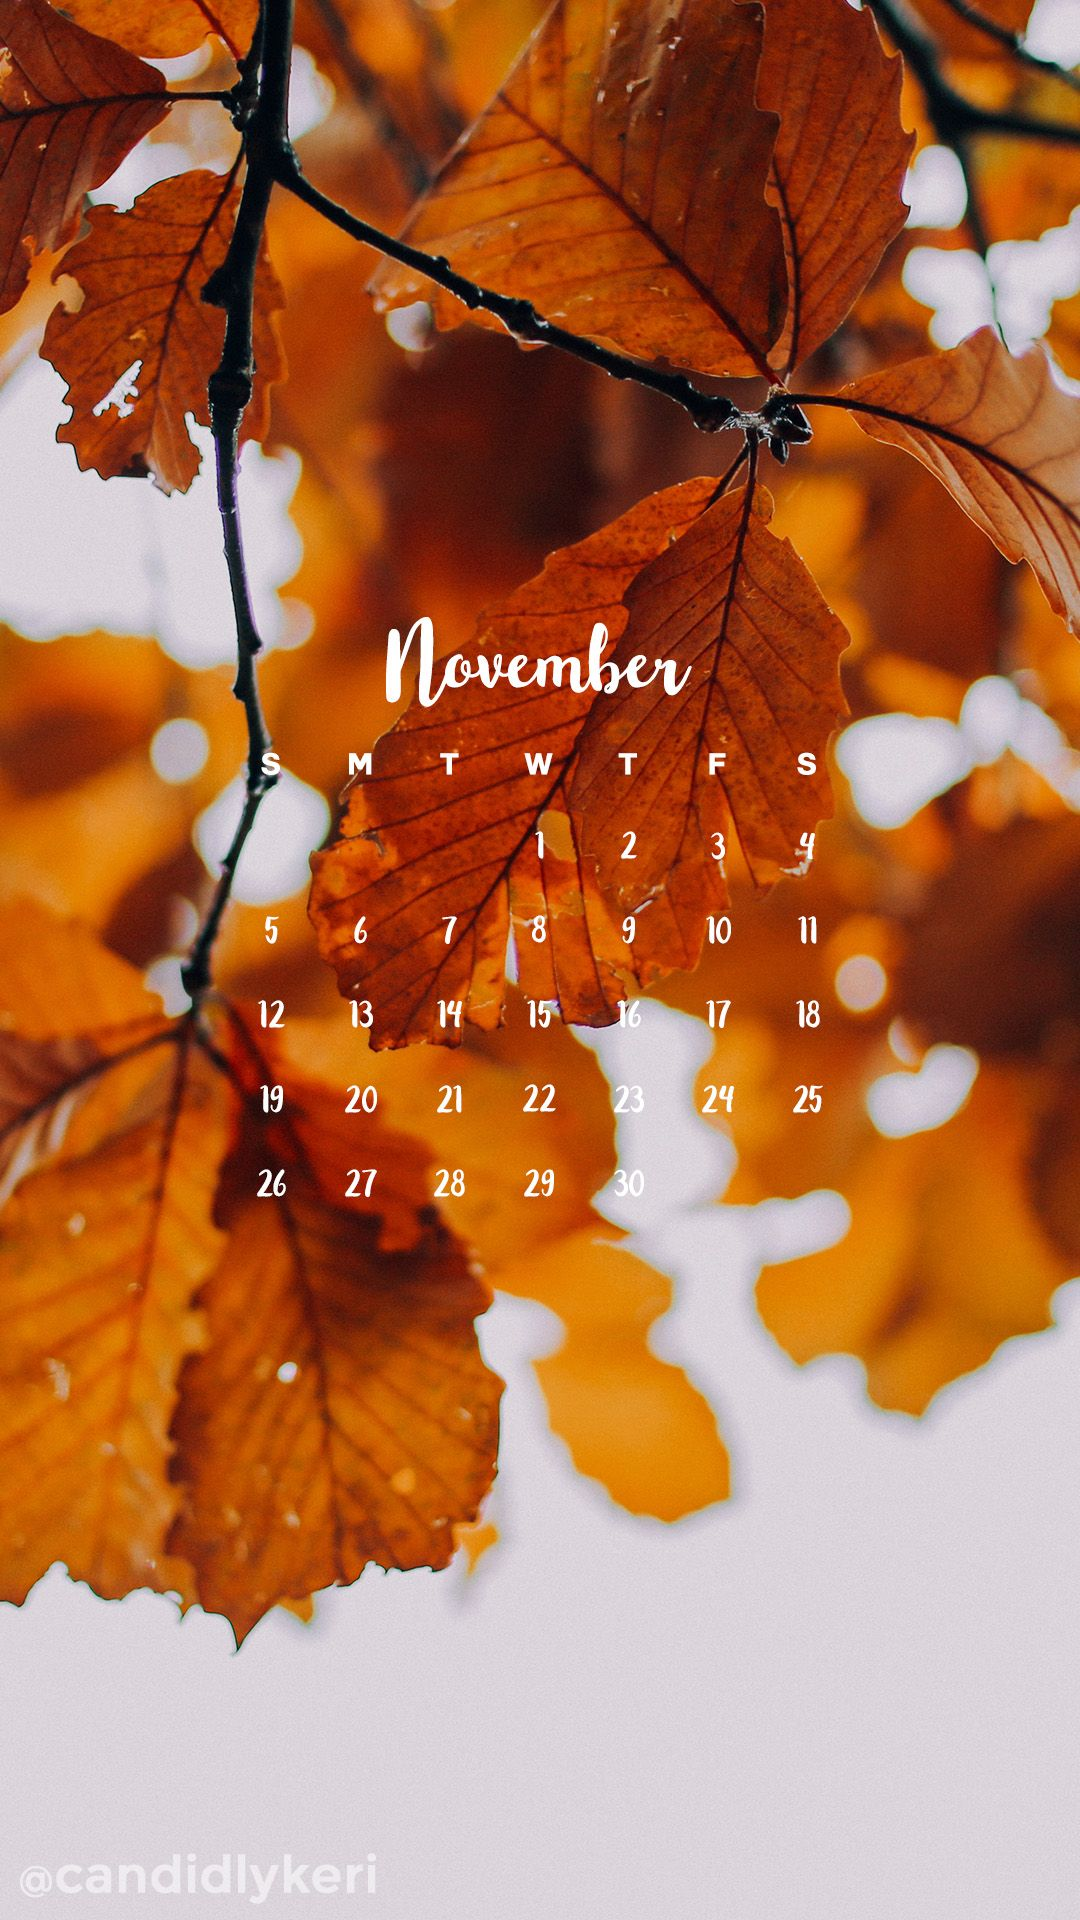 1 Month Fall Wallpaper Bundle November calendar